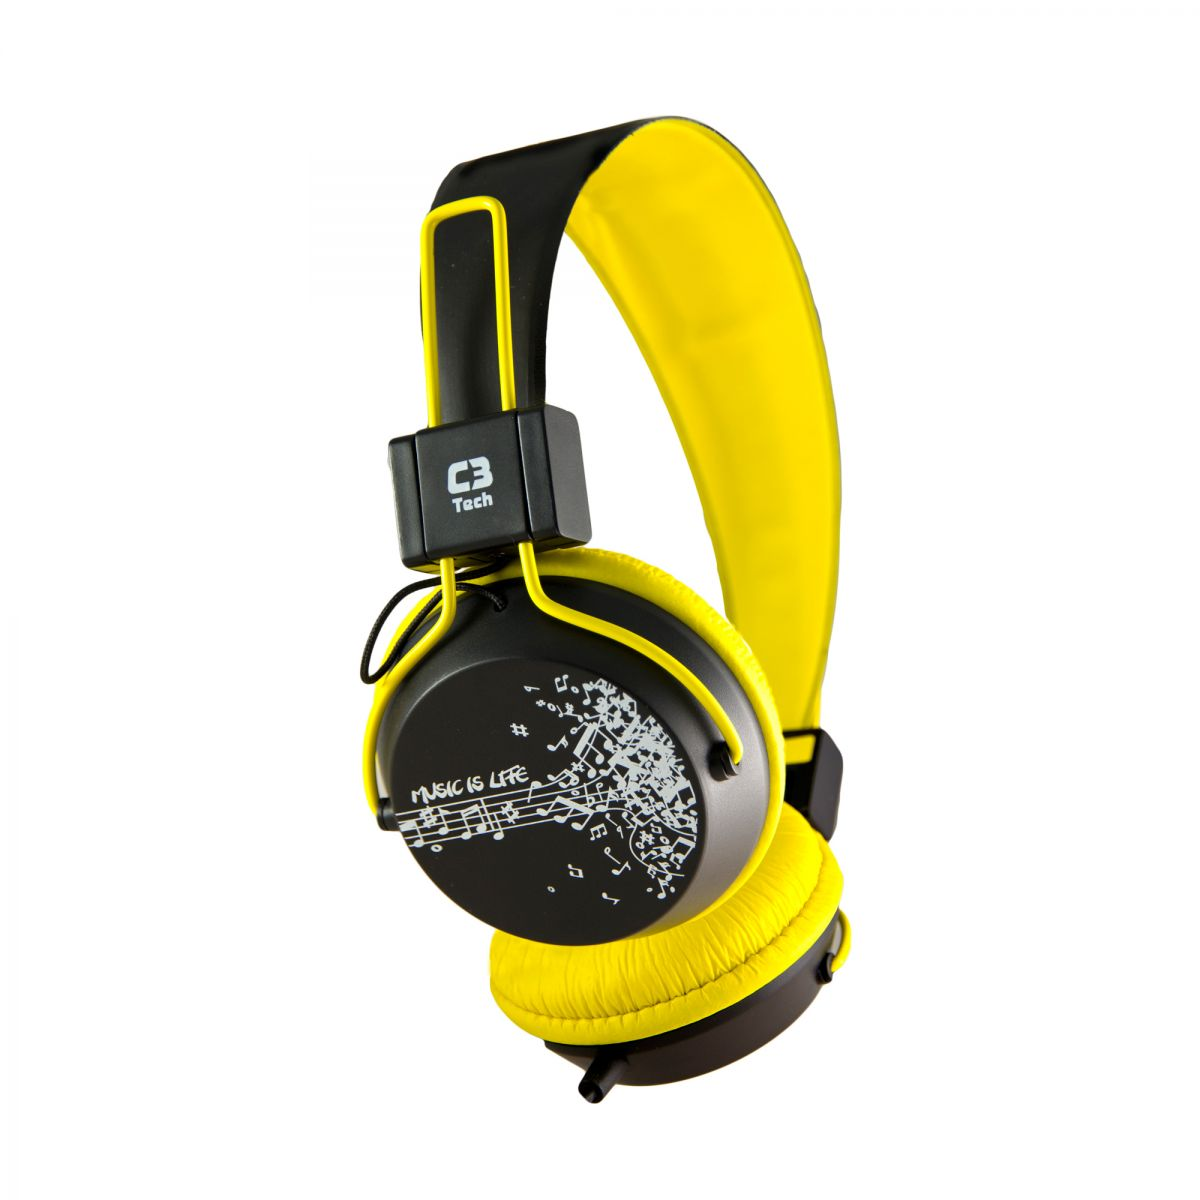 Fone de Ouvido Headset Multimídia Preto/Amalero C3 Tech - MI-2358RY  - ShopNoroeste.com.br